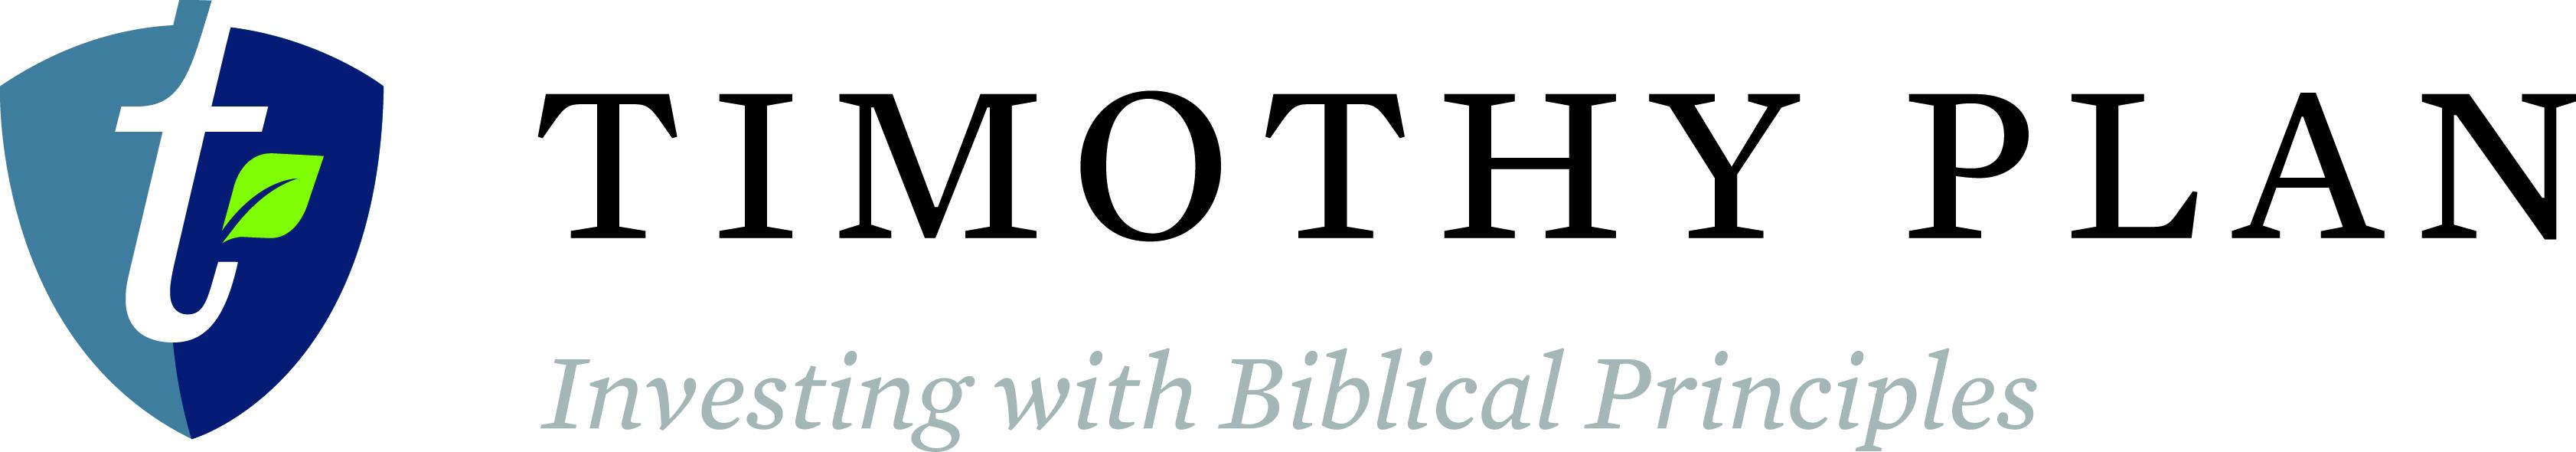 Timothy Plan - Florida Baptist Convention | FBC